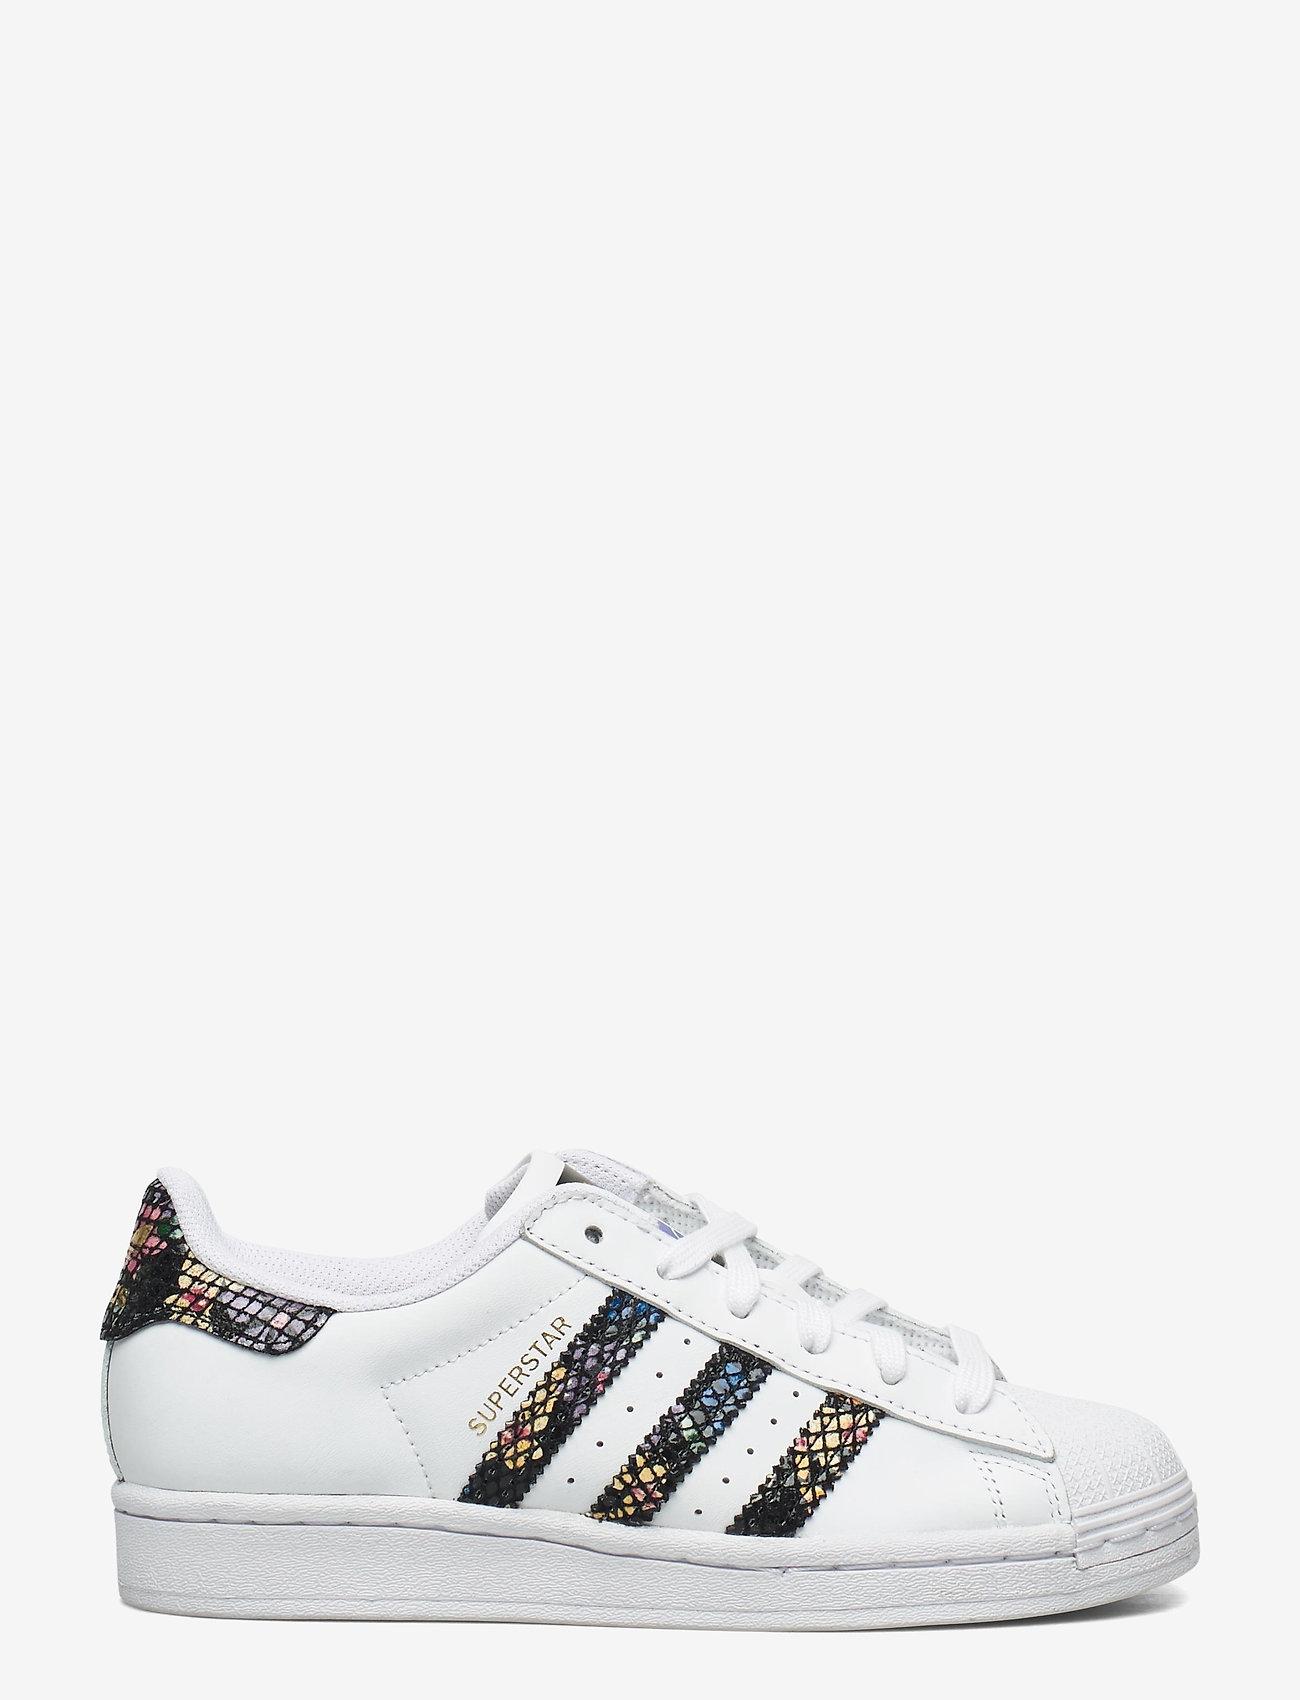 adidas Originals - SUPERSTAR W - låga sneakers - ftwwht/cblack/red - 1